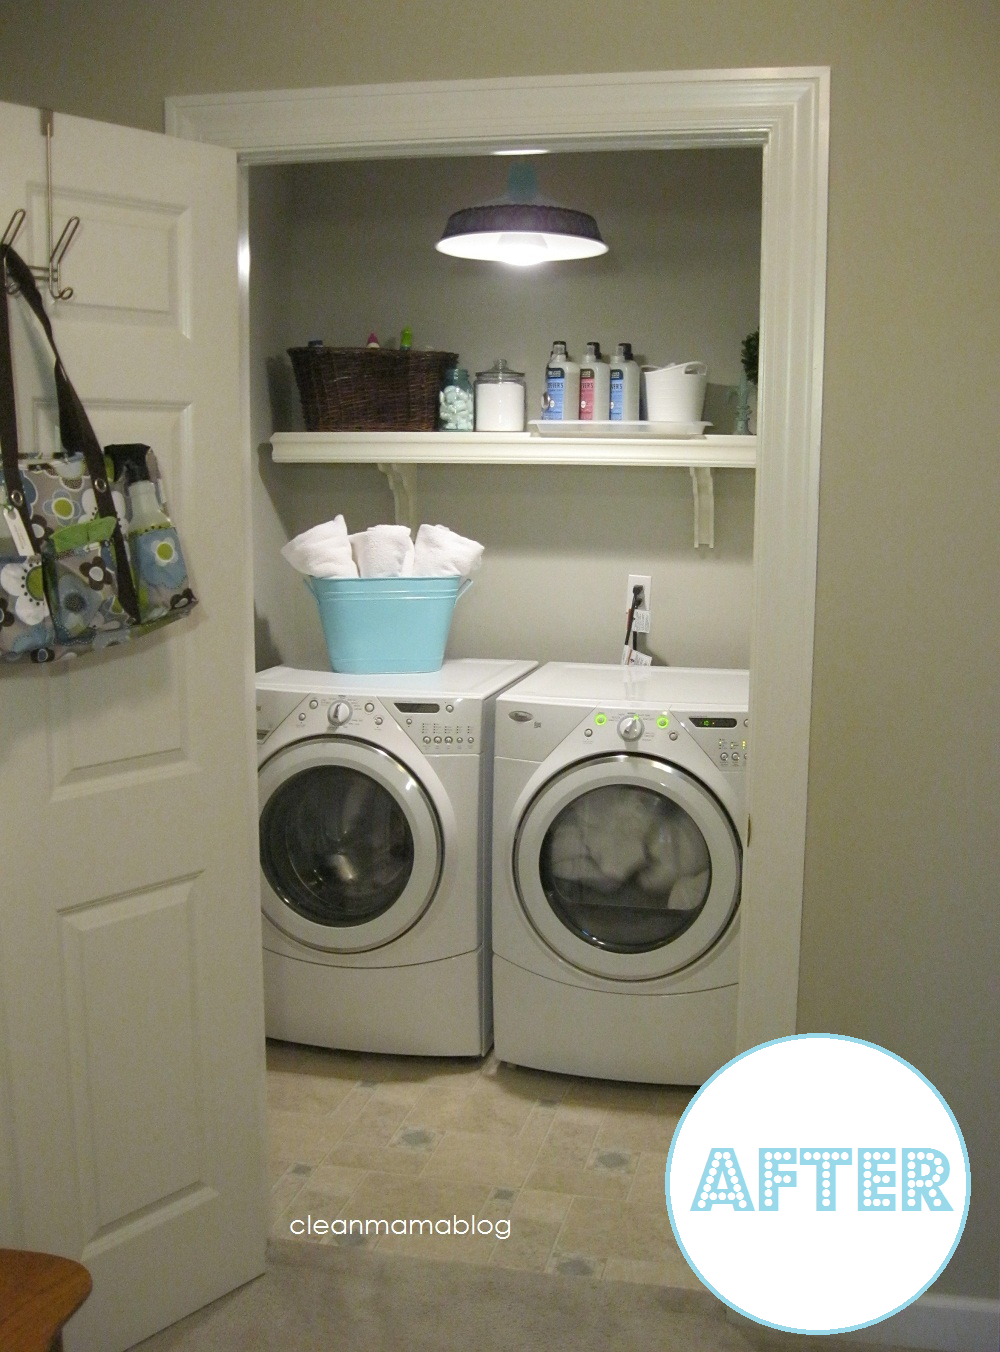 Wayfair Diy Challenge My Laundry Room Laundry Room Organization Laundry Room Organization Diy Laundry Room Diy